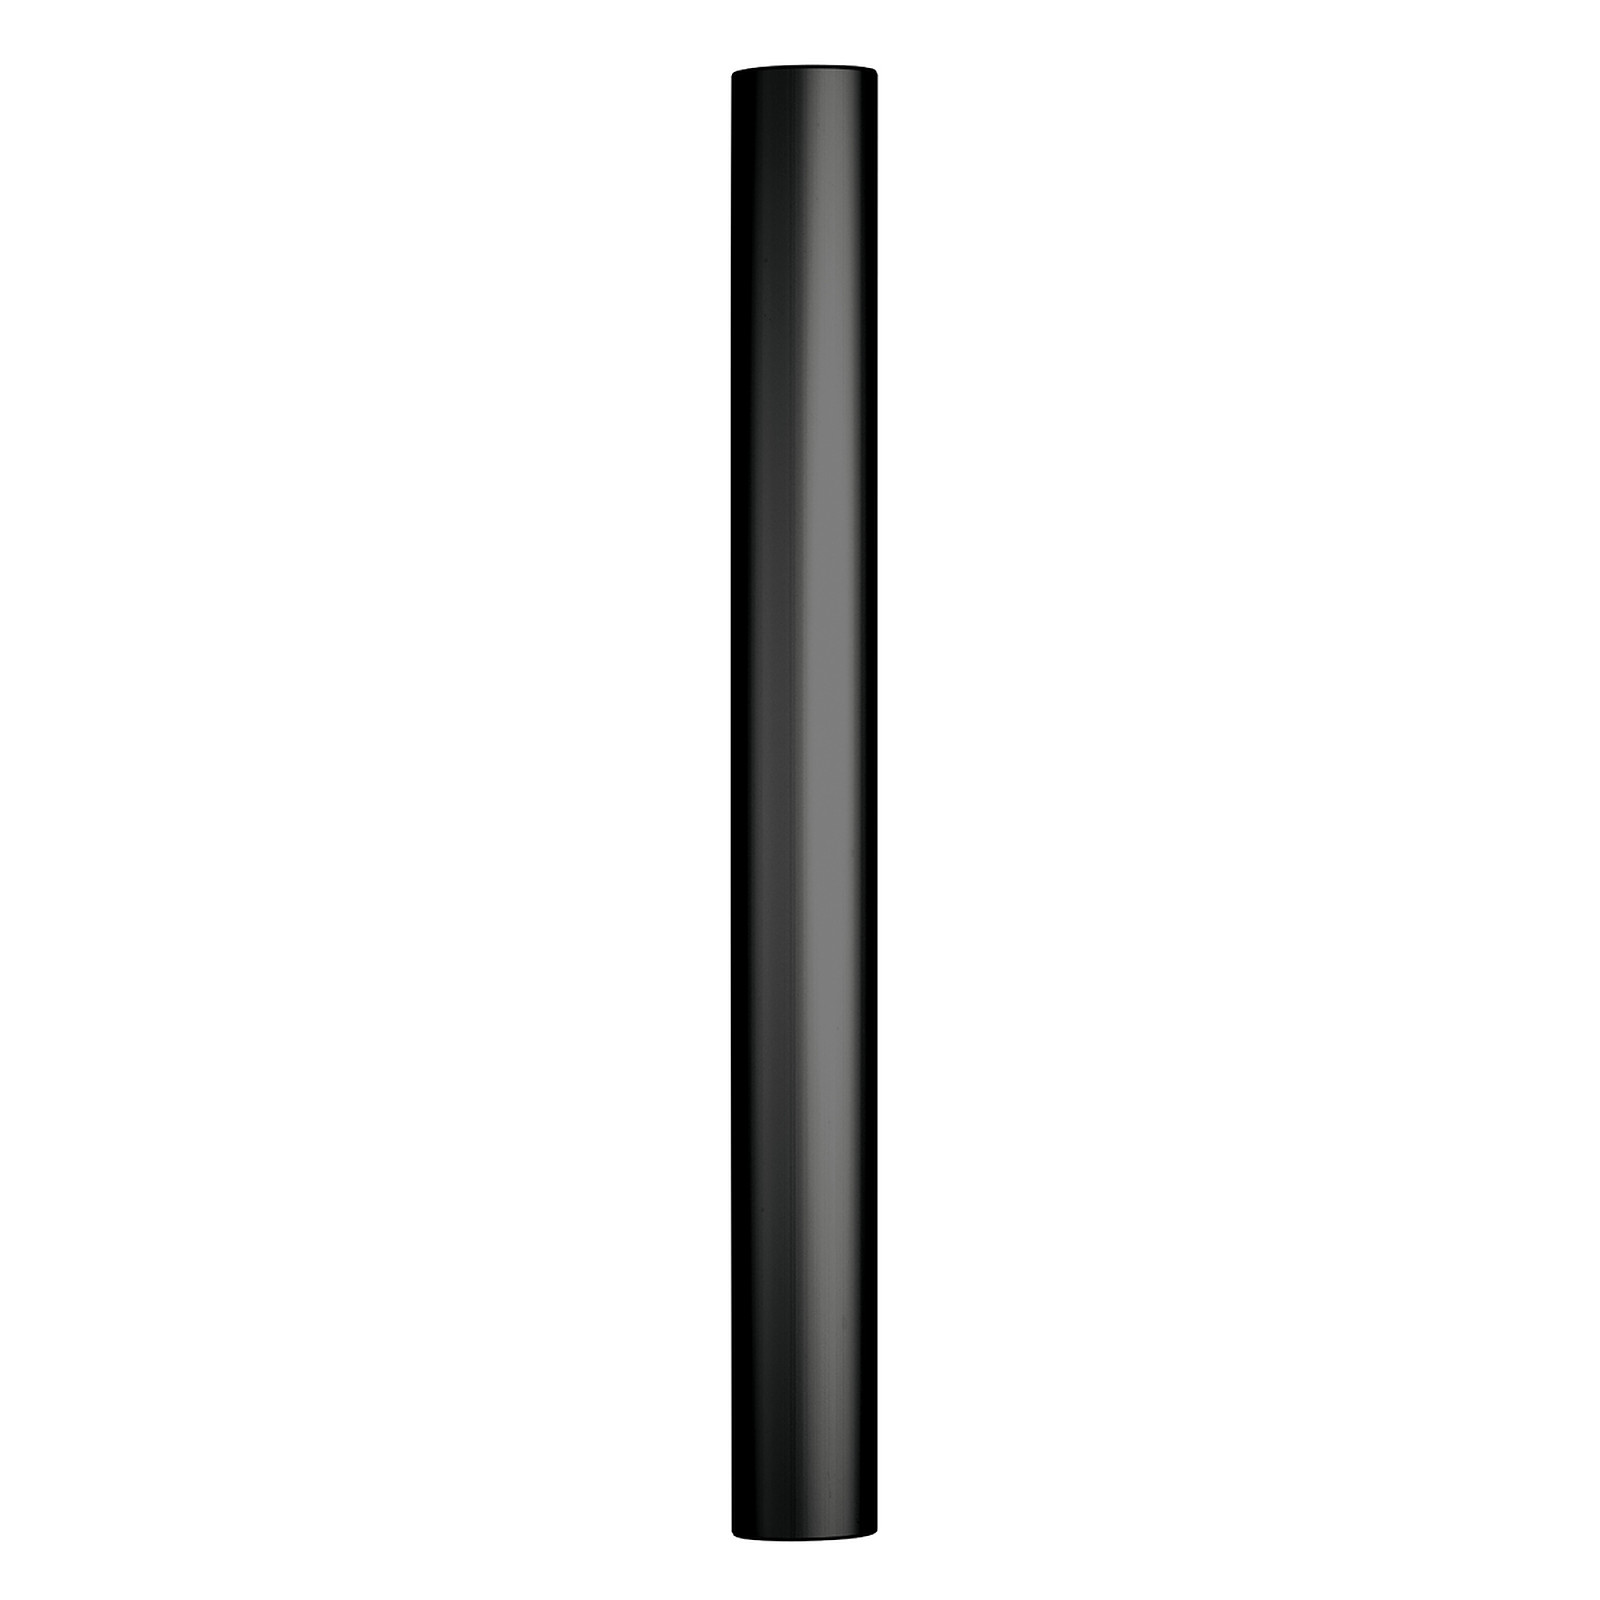 Meliconi Cable Cover 65 Maxi Noir